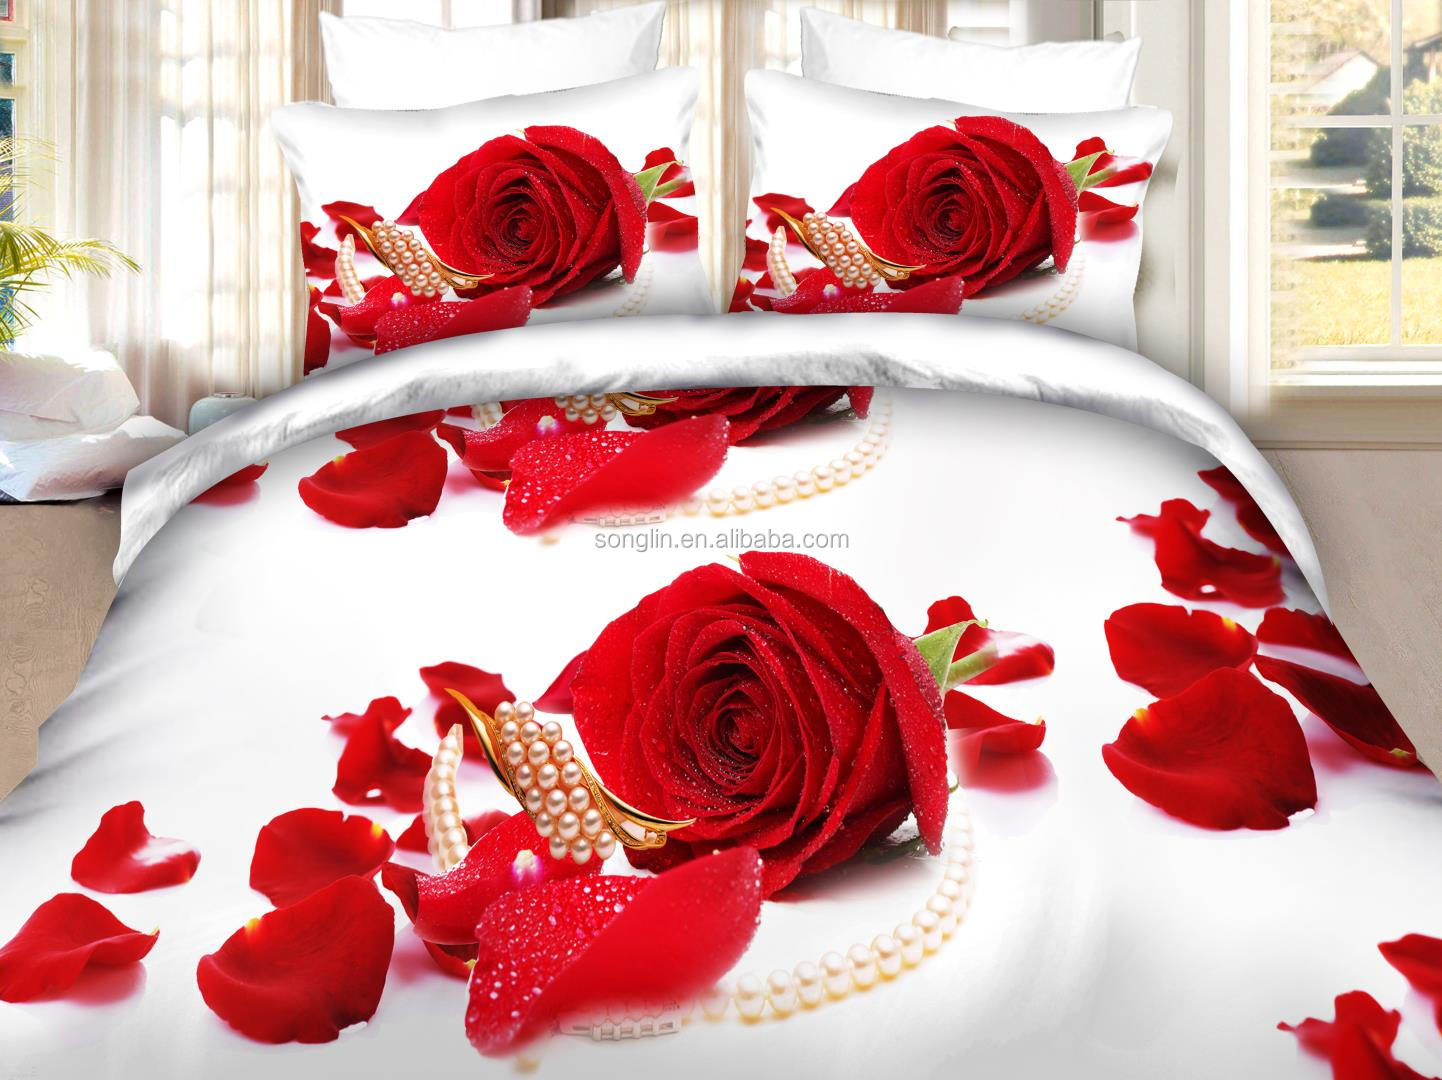 Wedding bed sheet set - Red Rose 3d Disperse Printing Bedsheet Set For Wedding